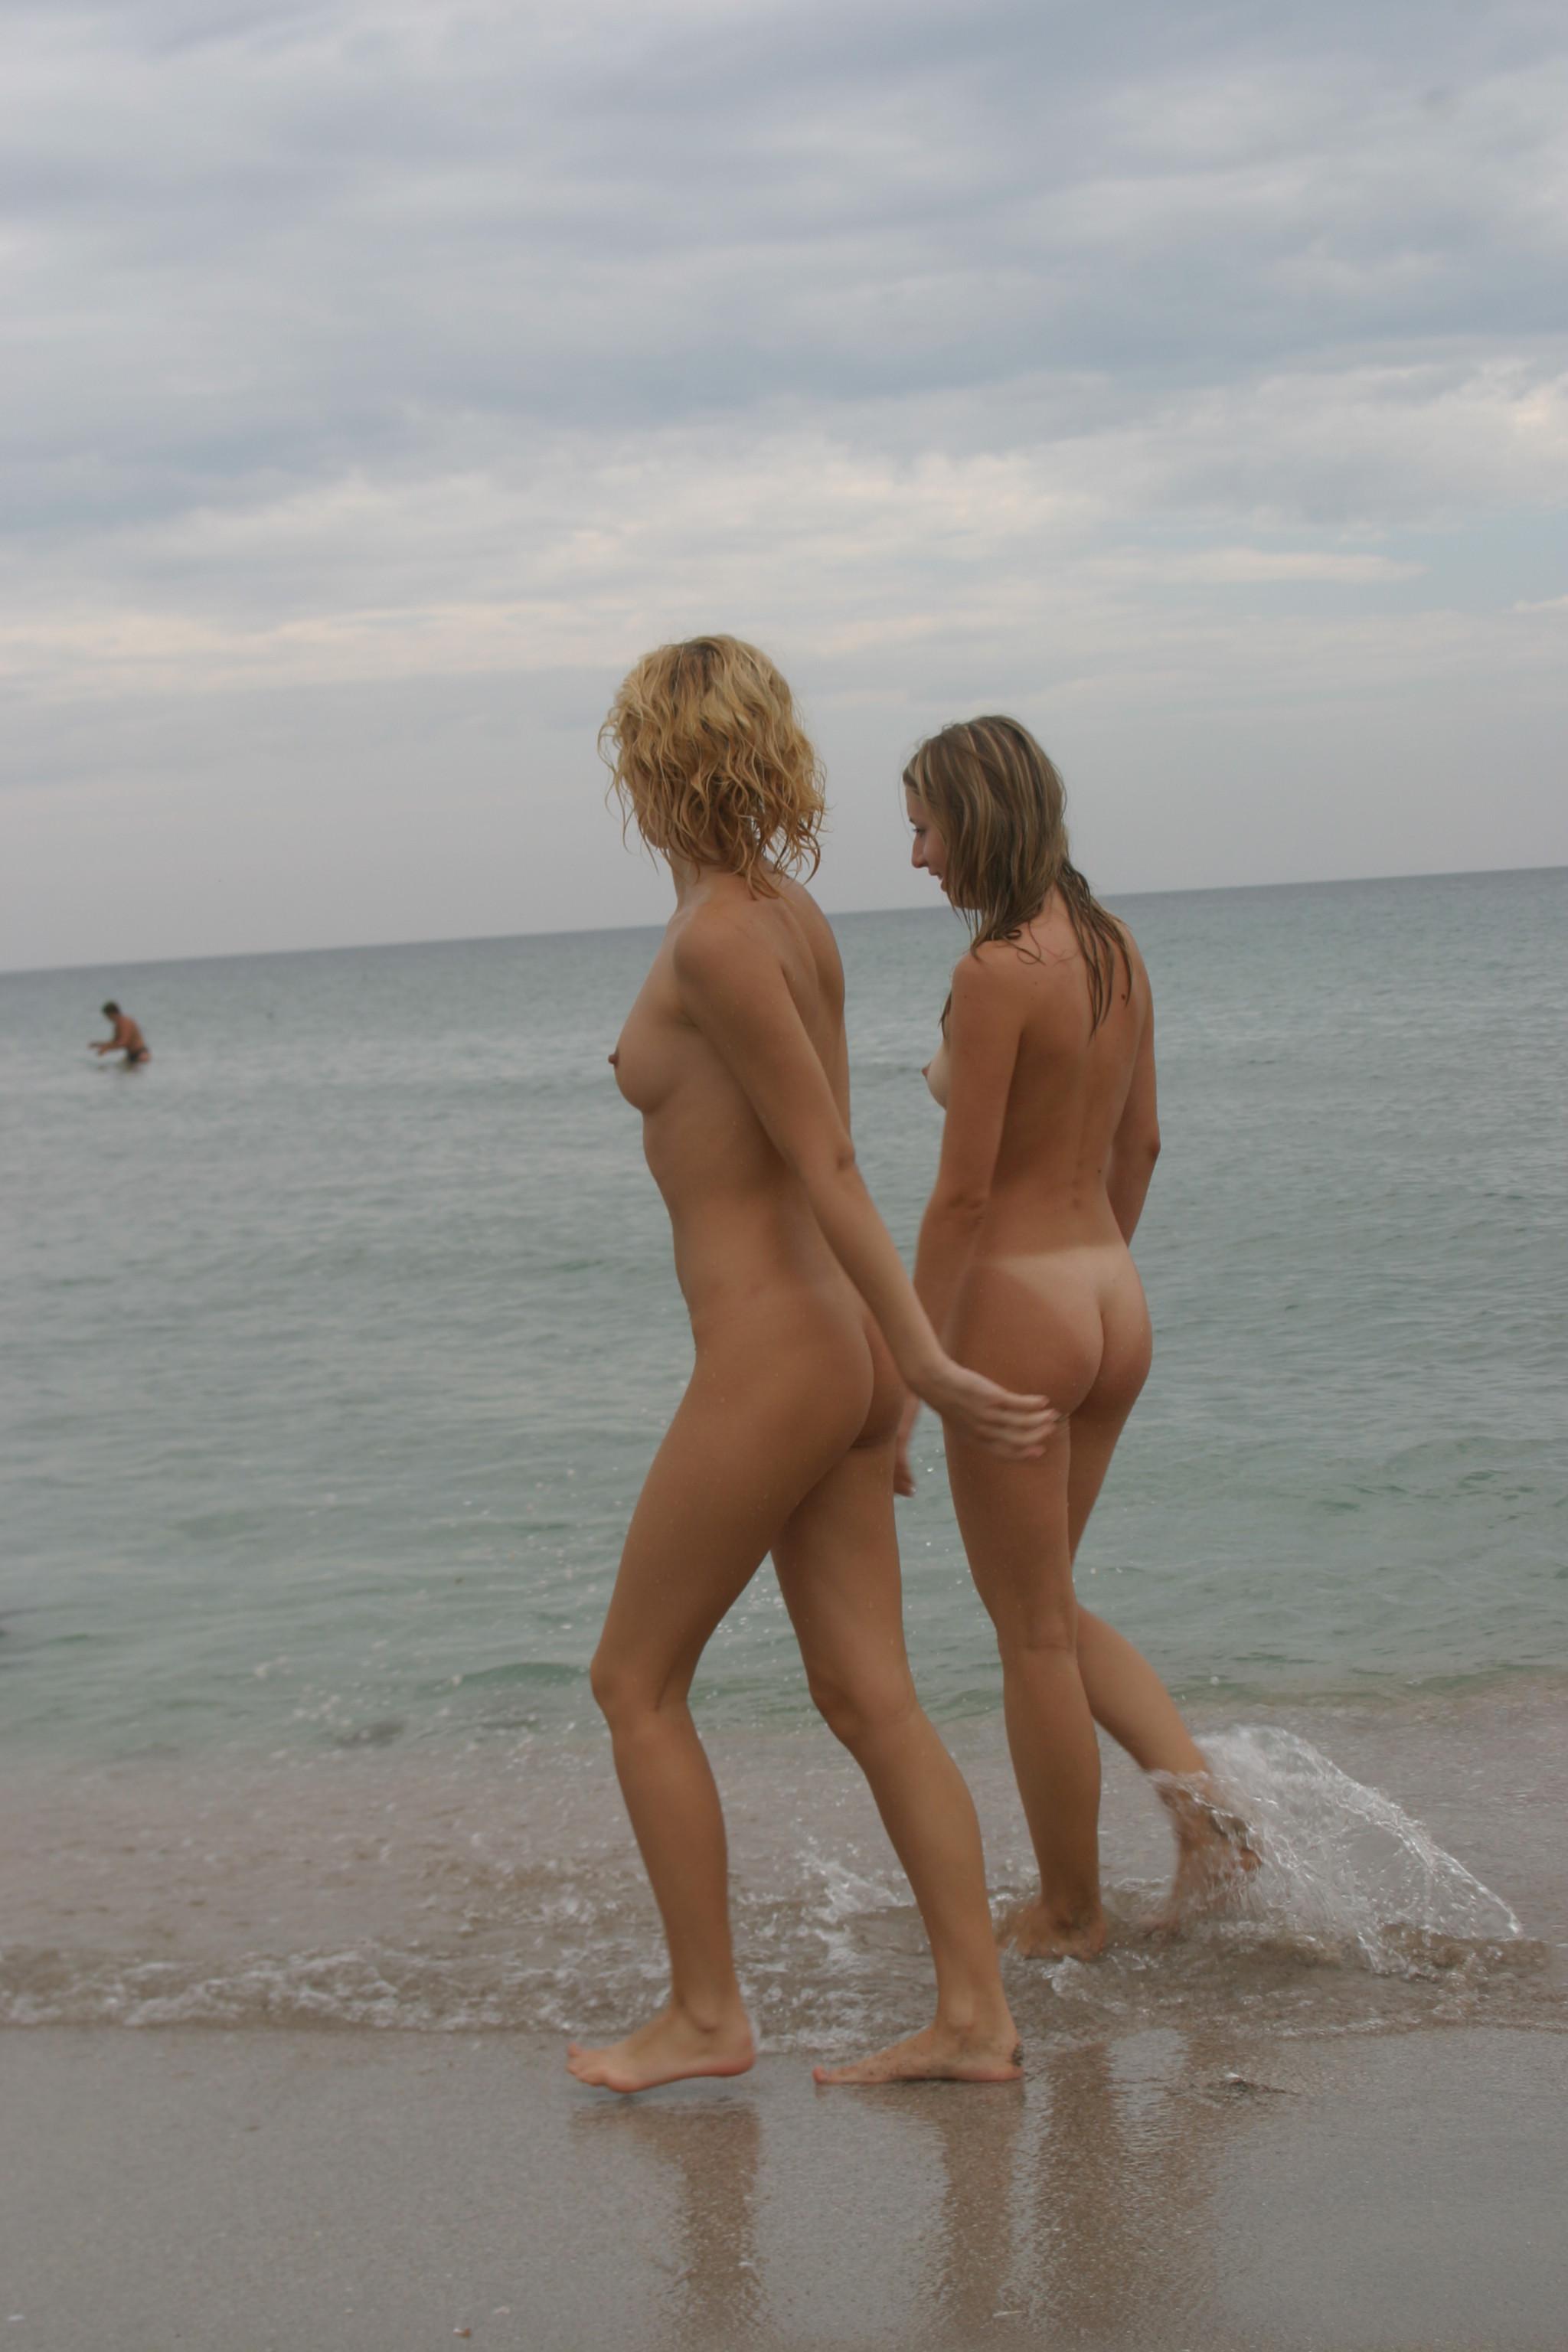 vika-y-lena-l-beach-nude-in-public-metart-04